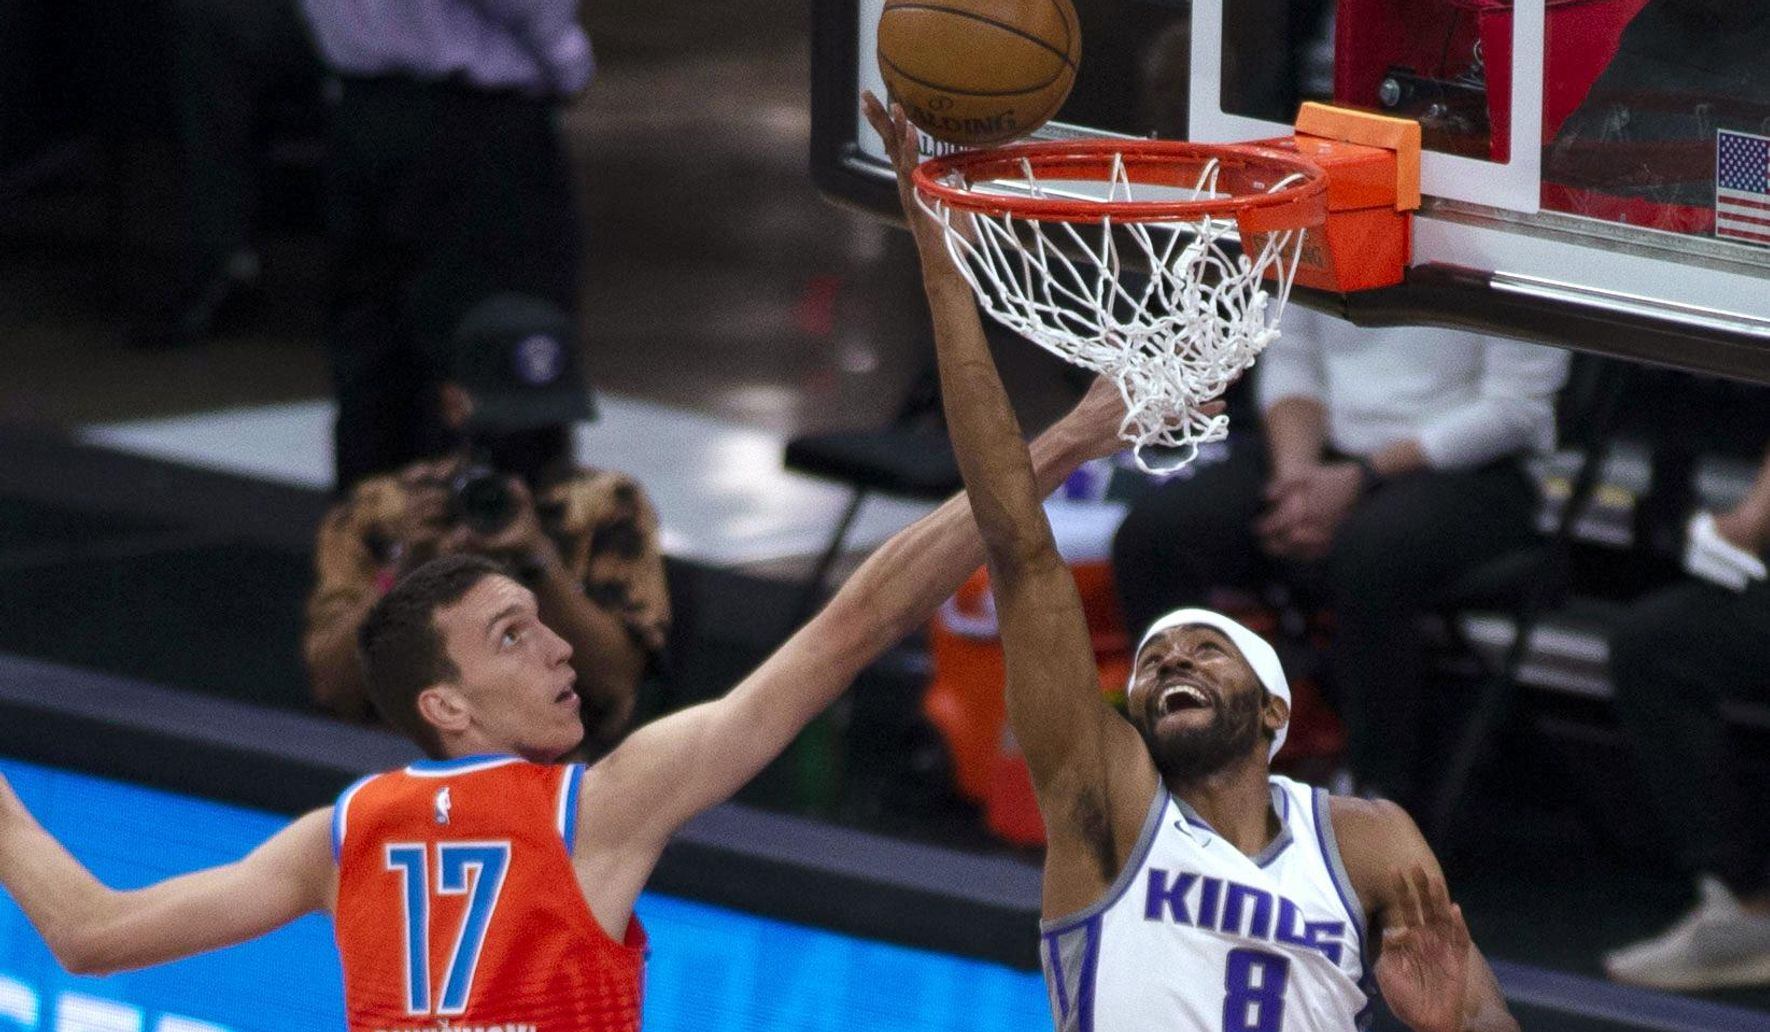 Thunder_kings_basketball_17185_c0-68-1645-1027_s1770x1032